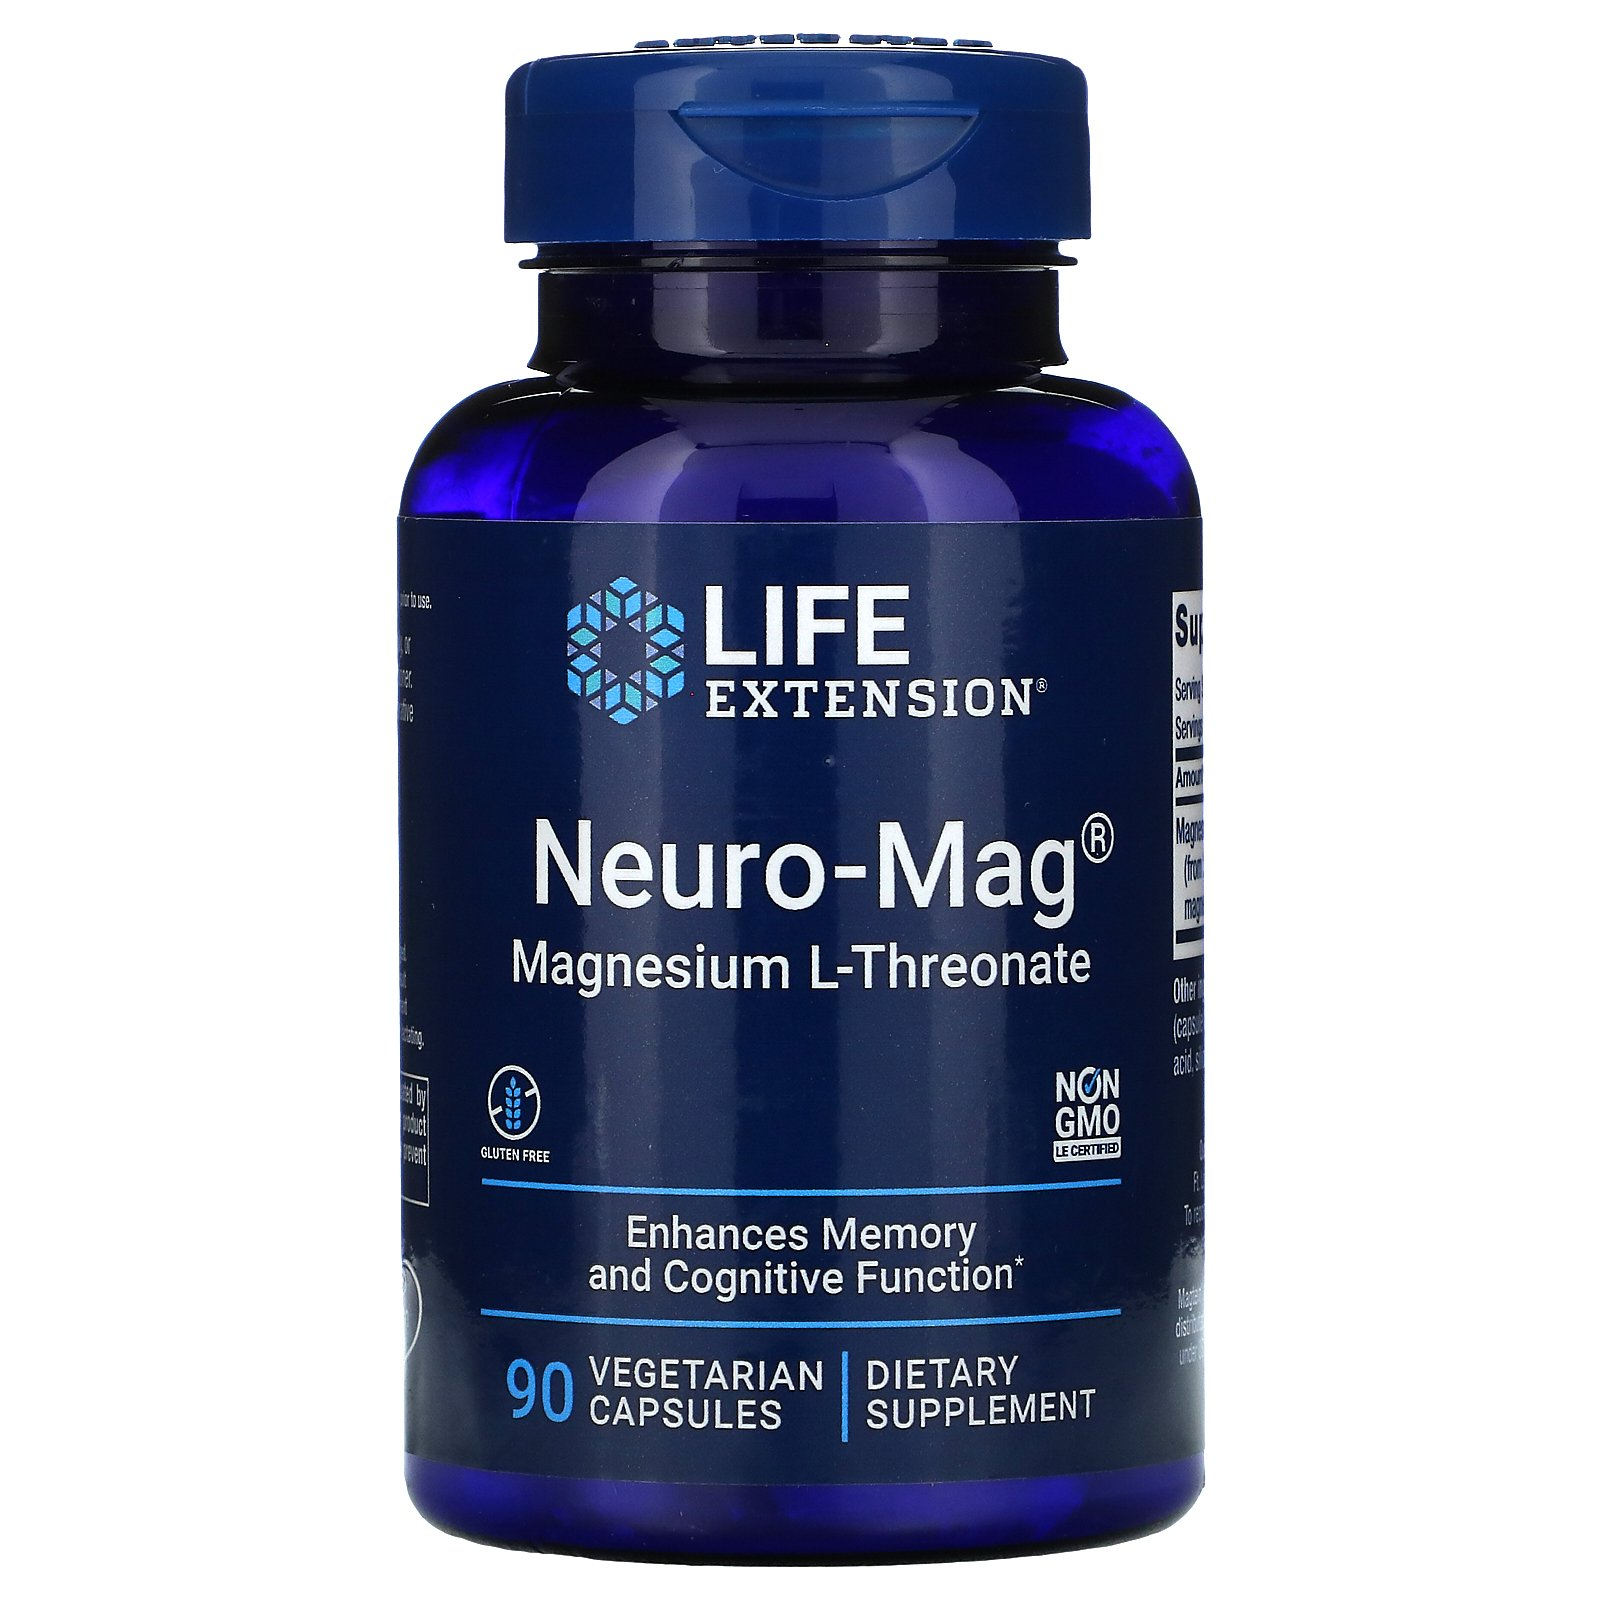 Life Extension, Neuro-Mag, магний L-треонат, 90 вегетарианских капсул